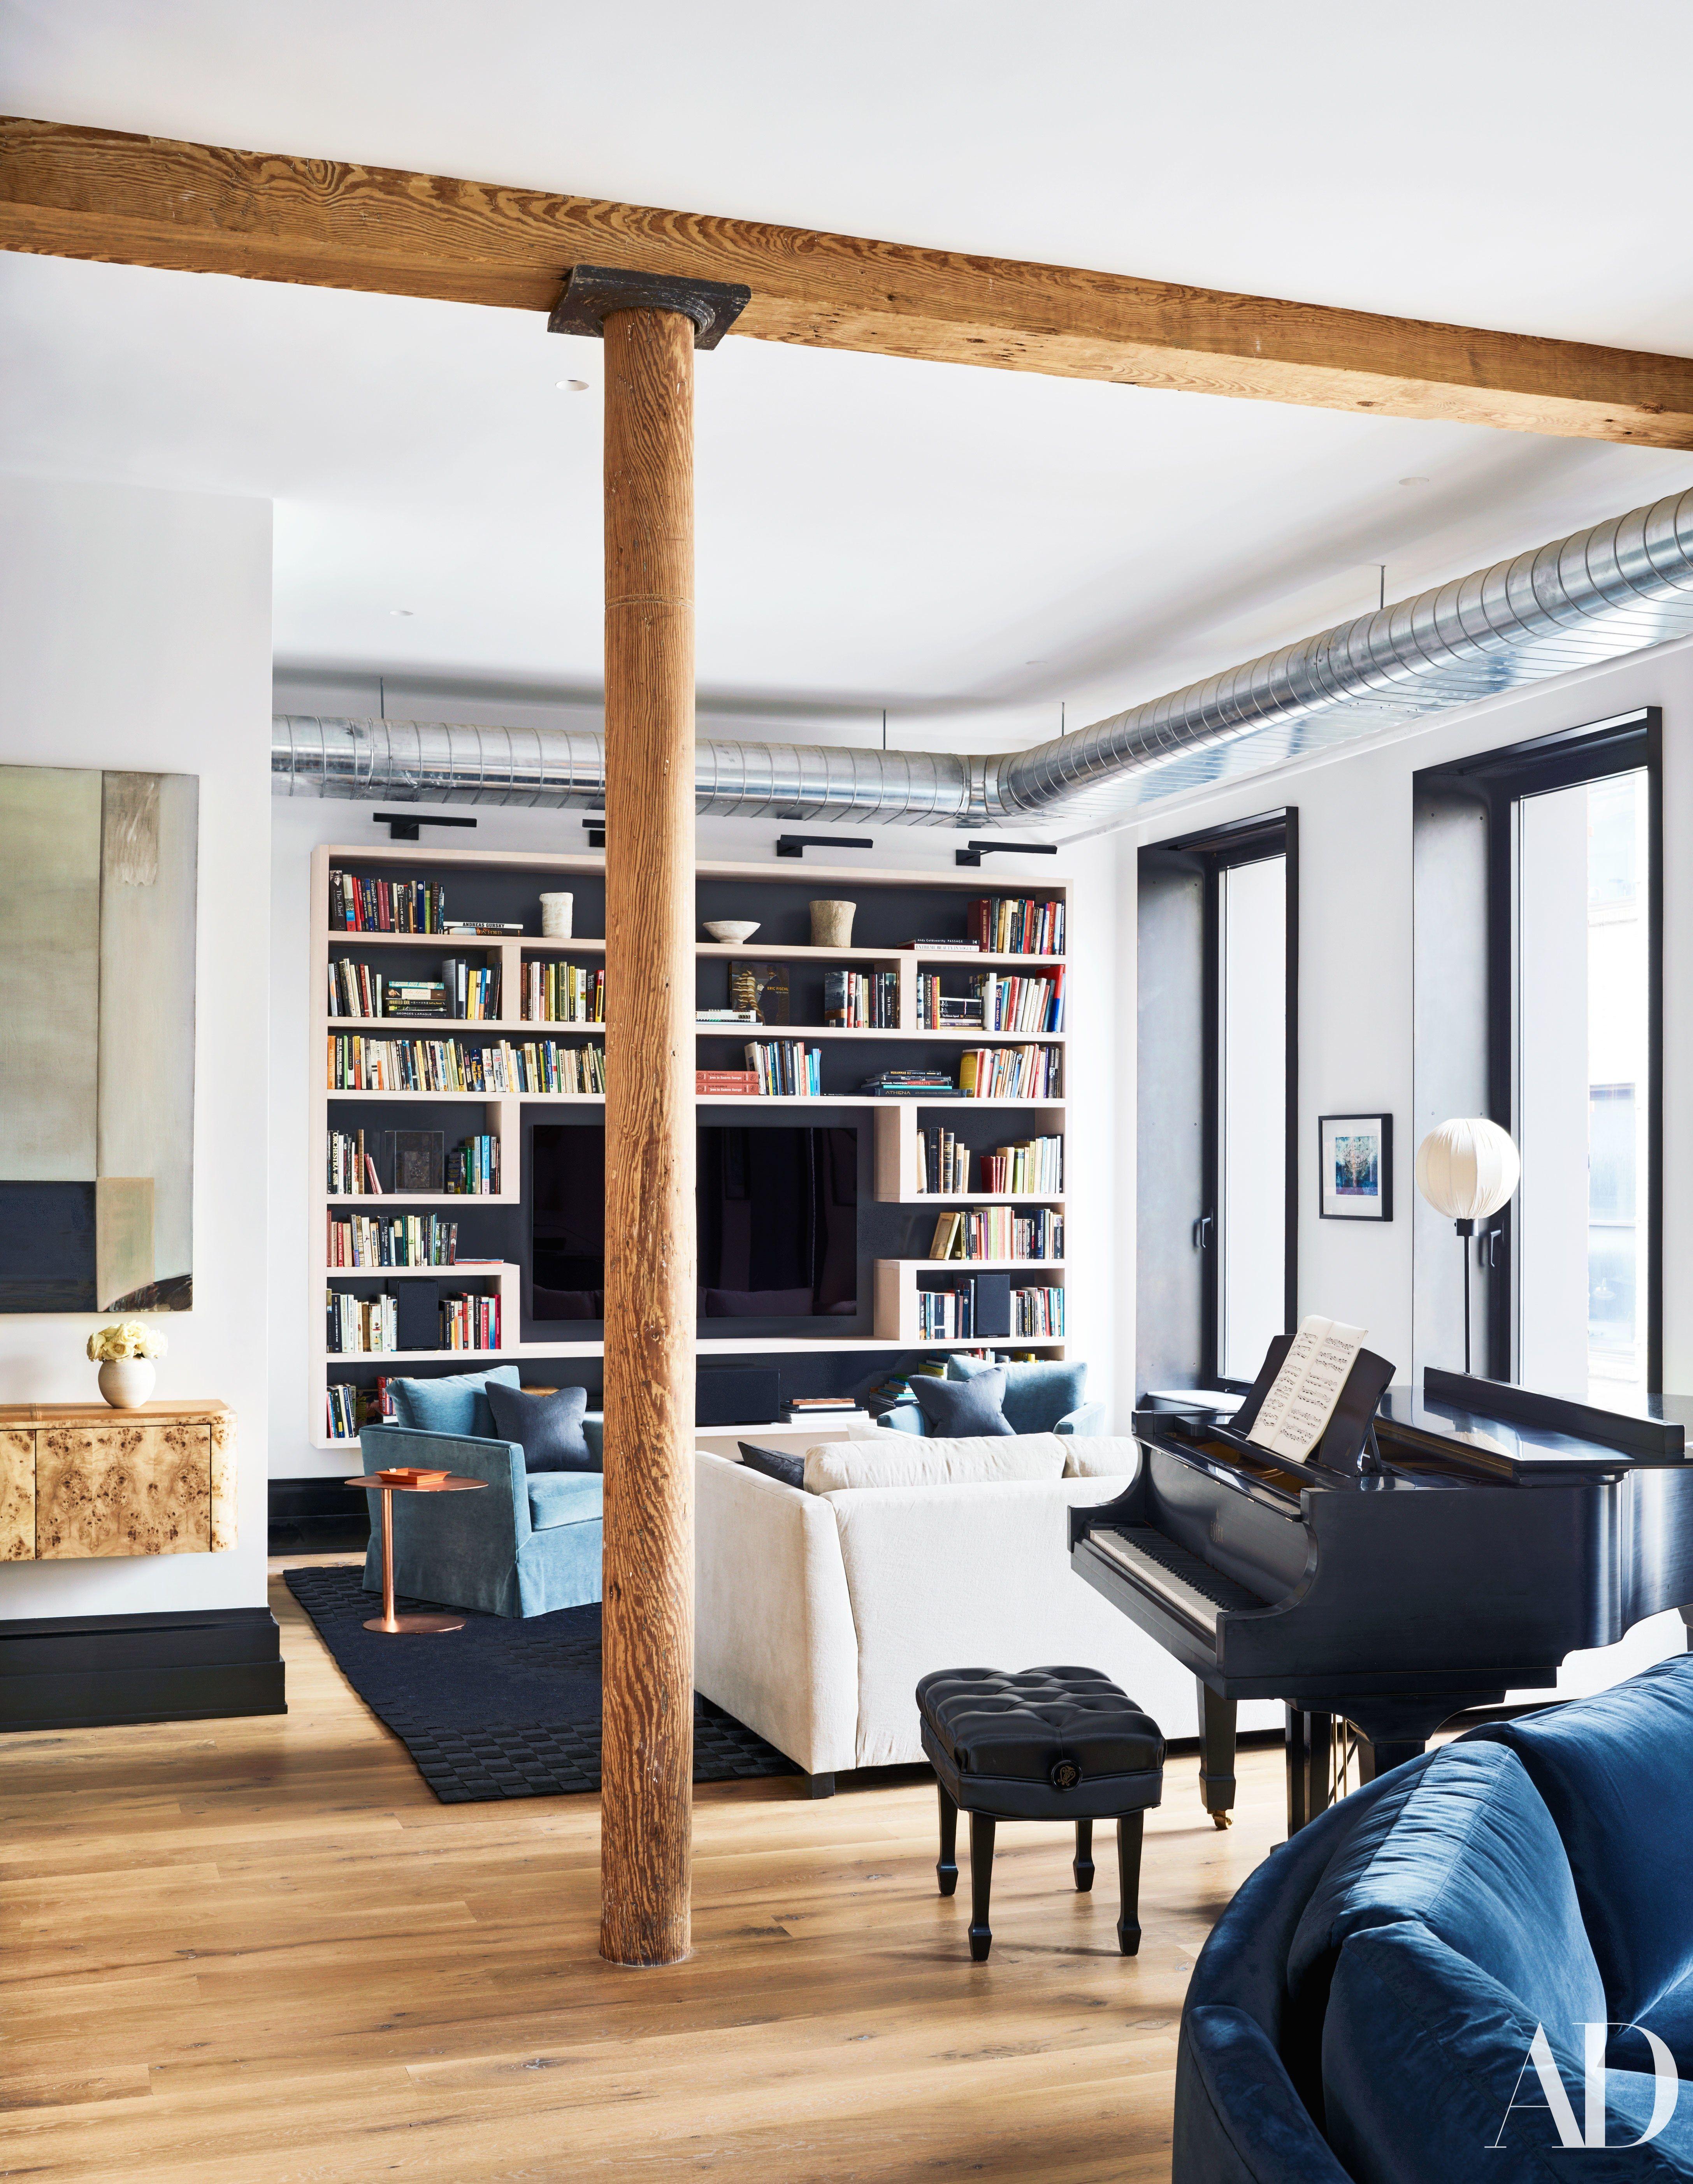 go inside liev schreiber s noho triplex bookshelf s built in rh pinterest com